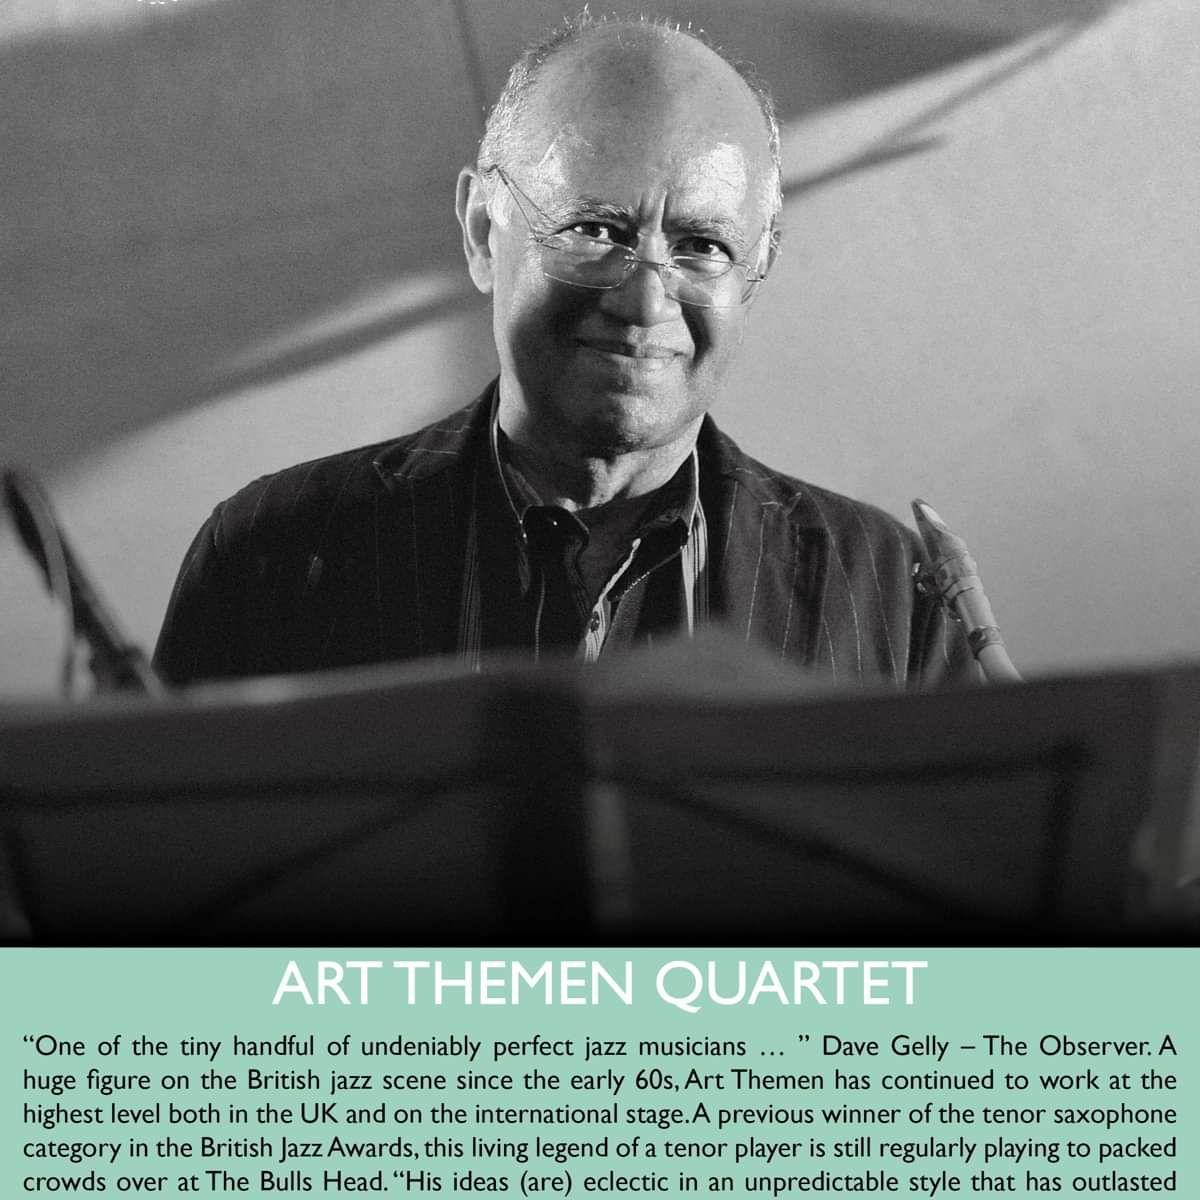 Art Themen Quartet at Bulls Head Barnes, London on 20 Oct 2017